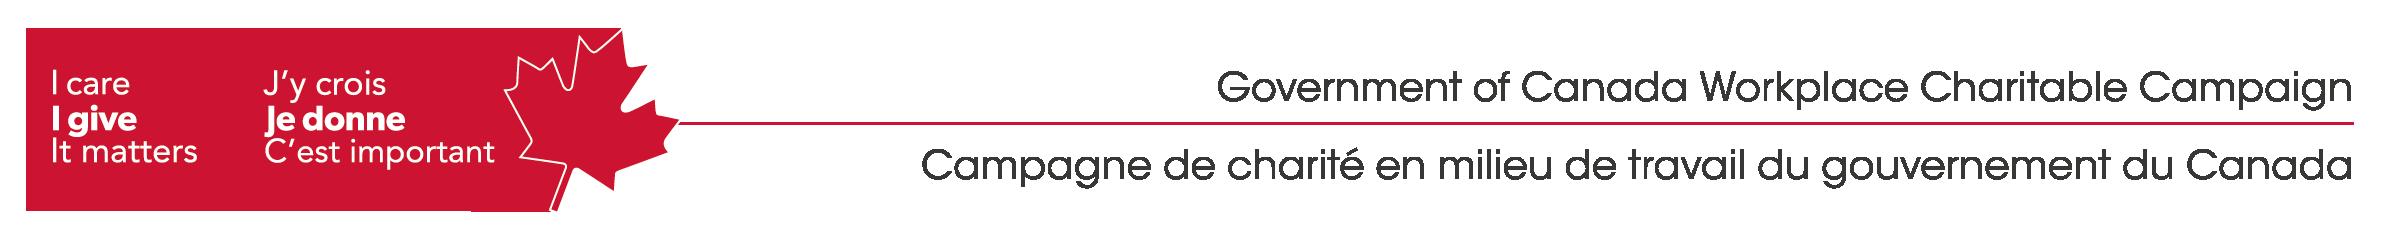 GCWCC2020_Banner-with-logo_EN-FR